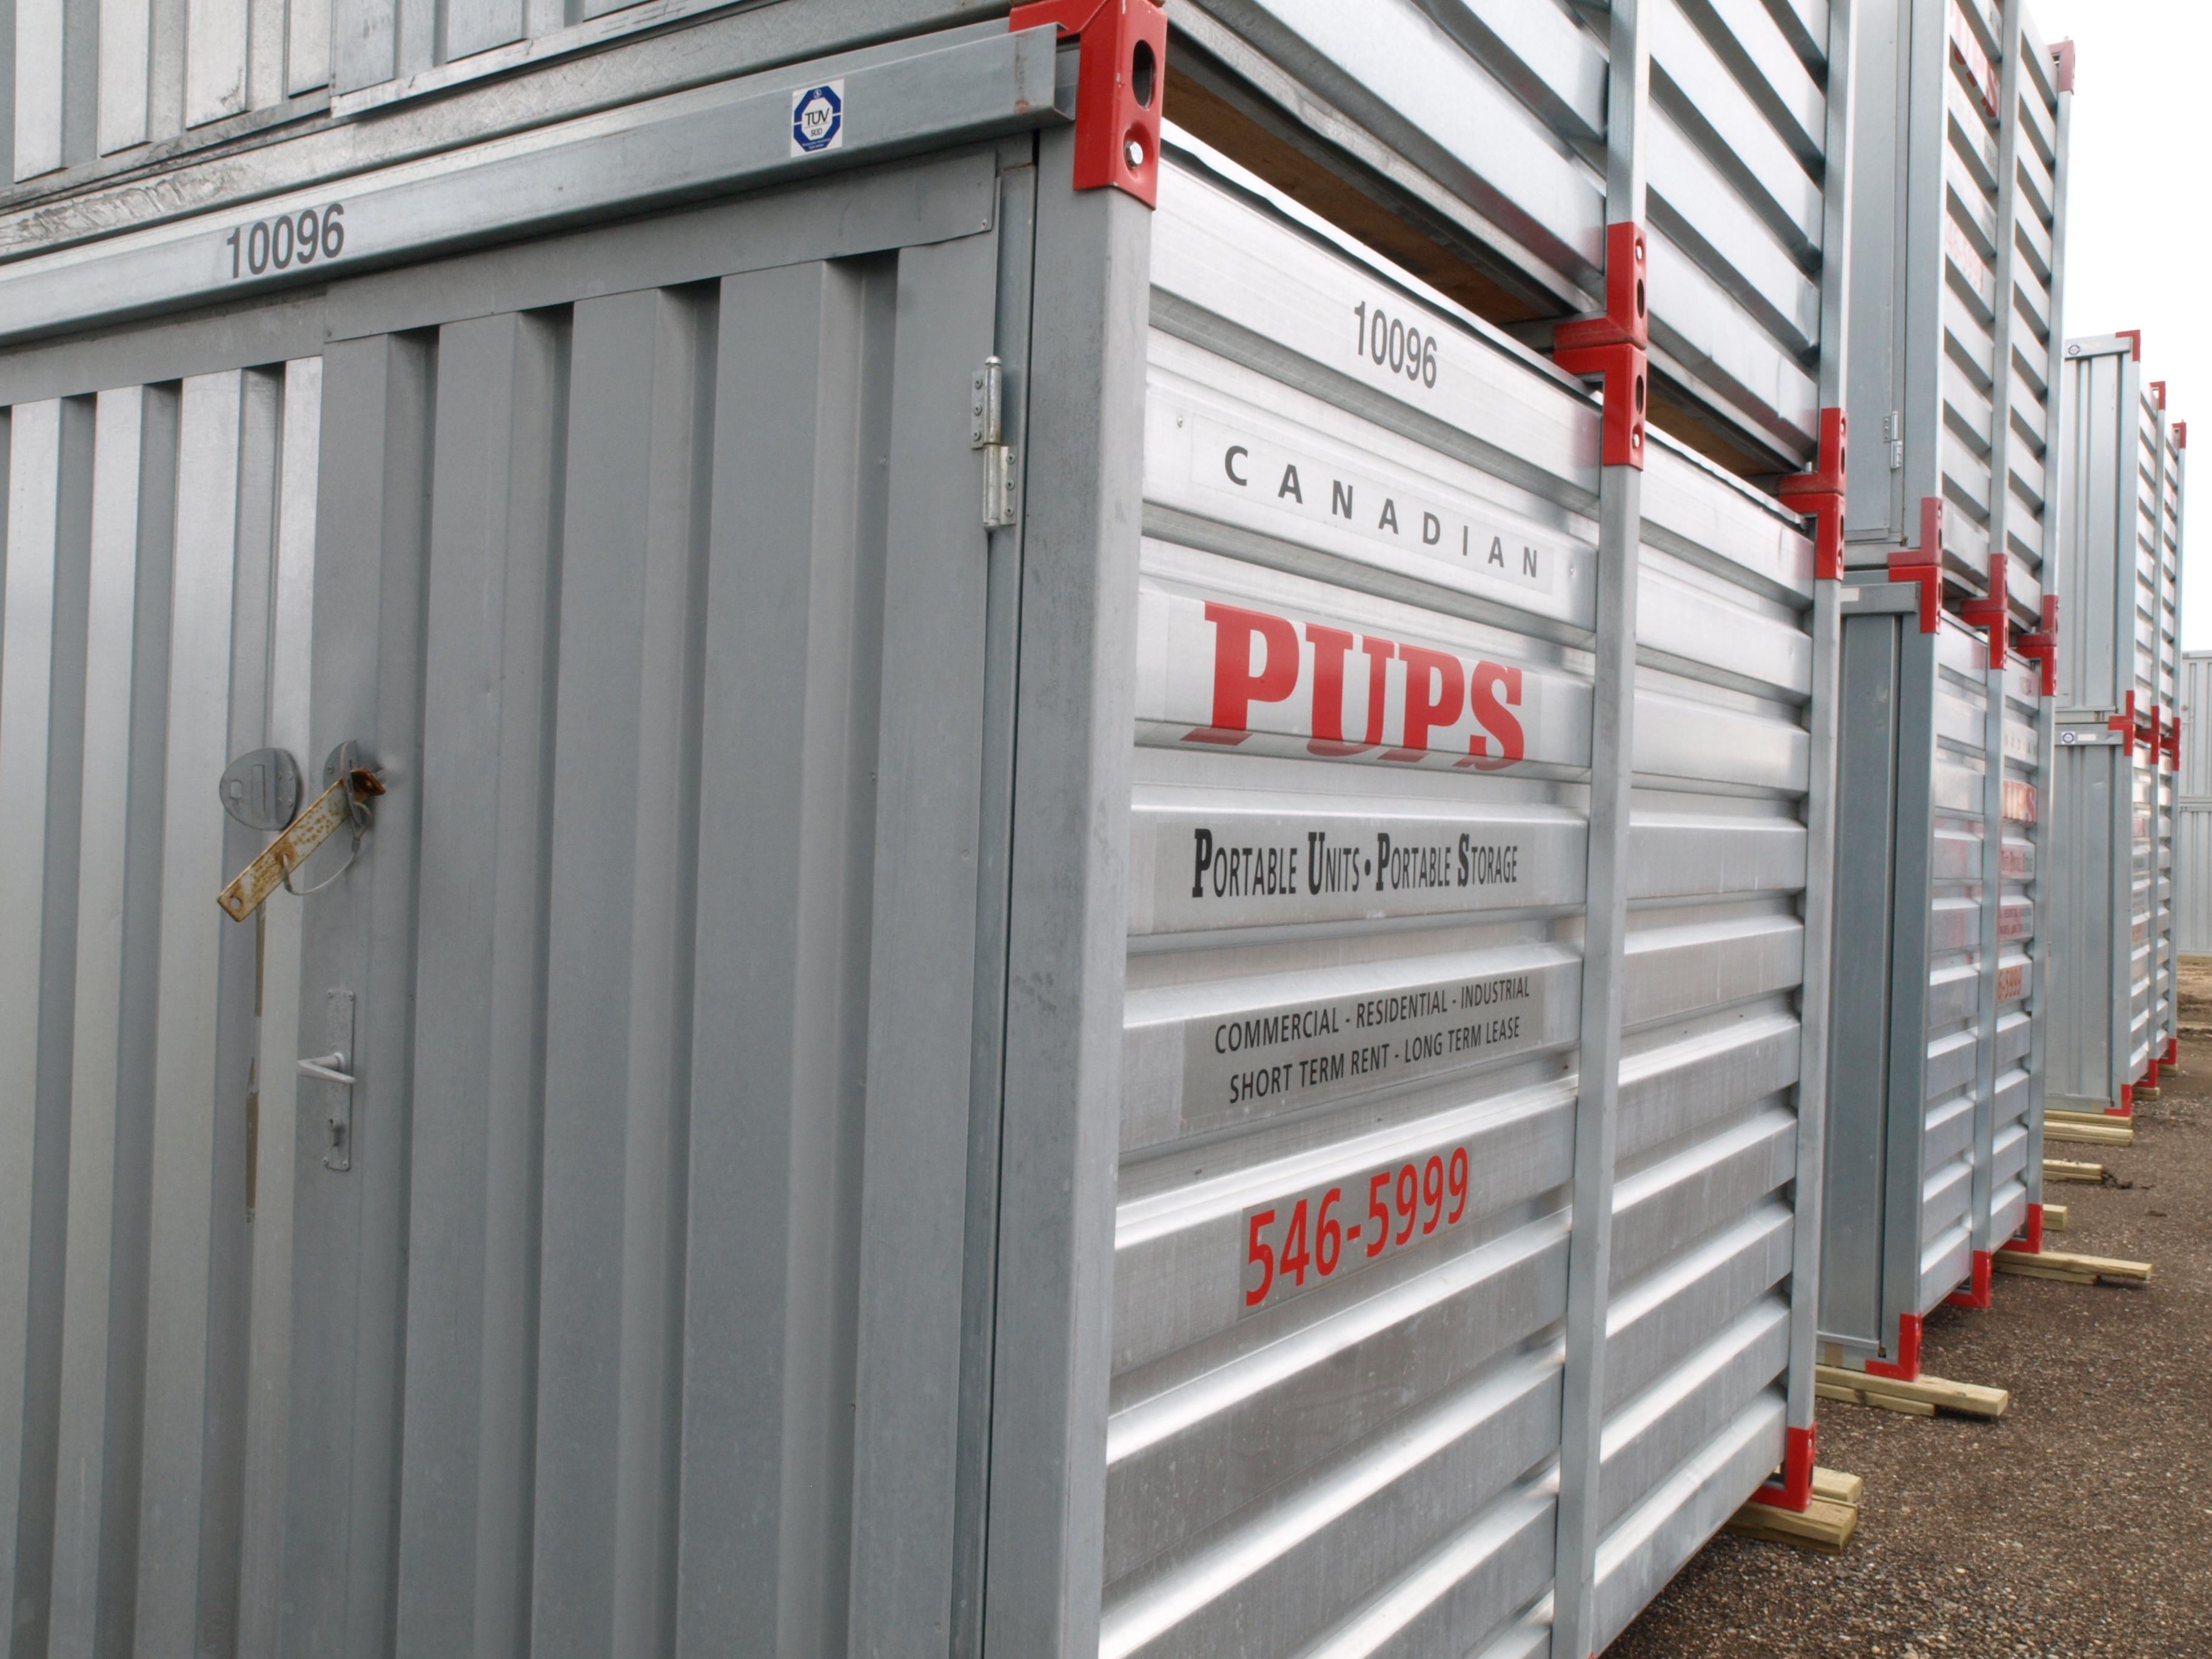 Canadian PUPS Portable Storage - Toronto